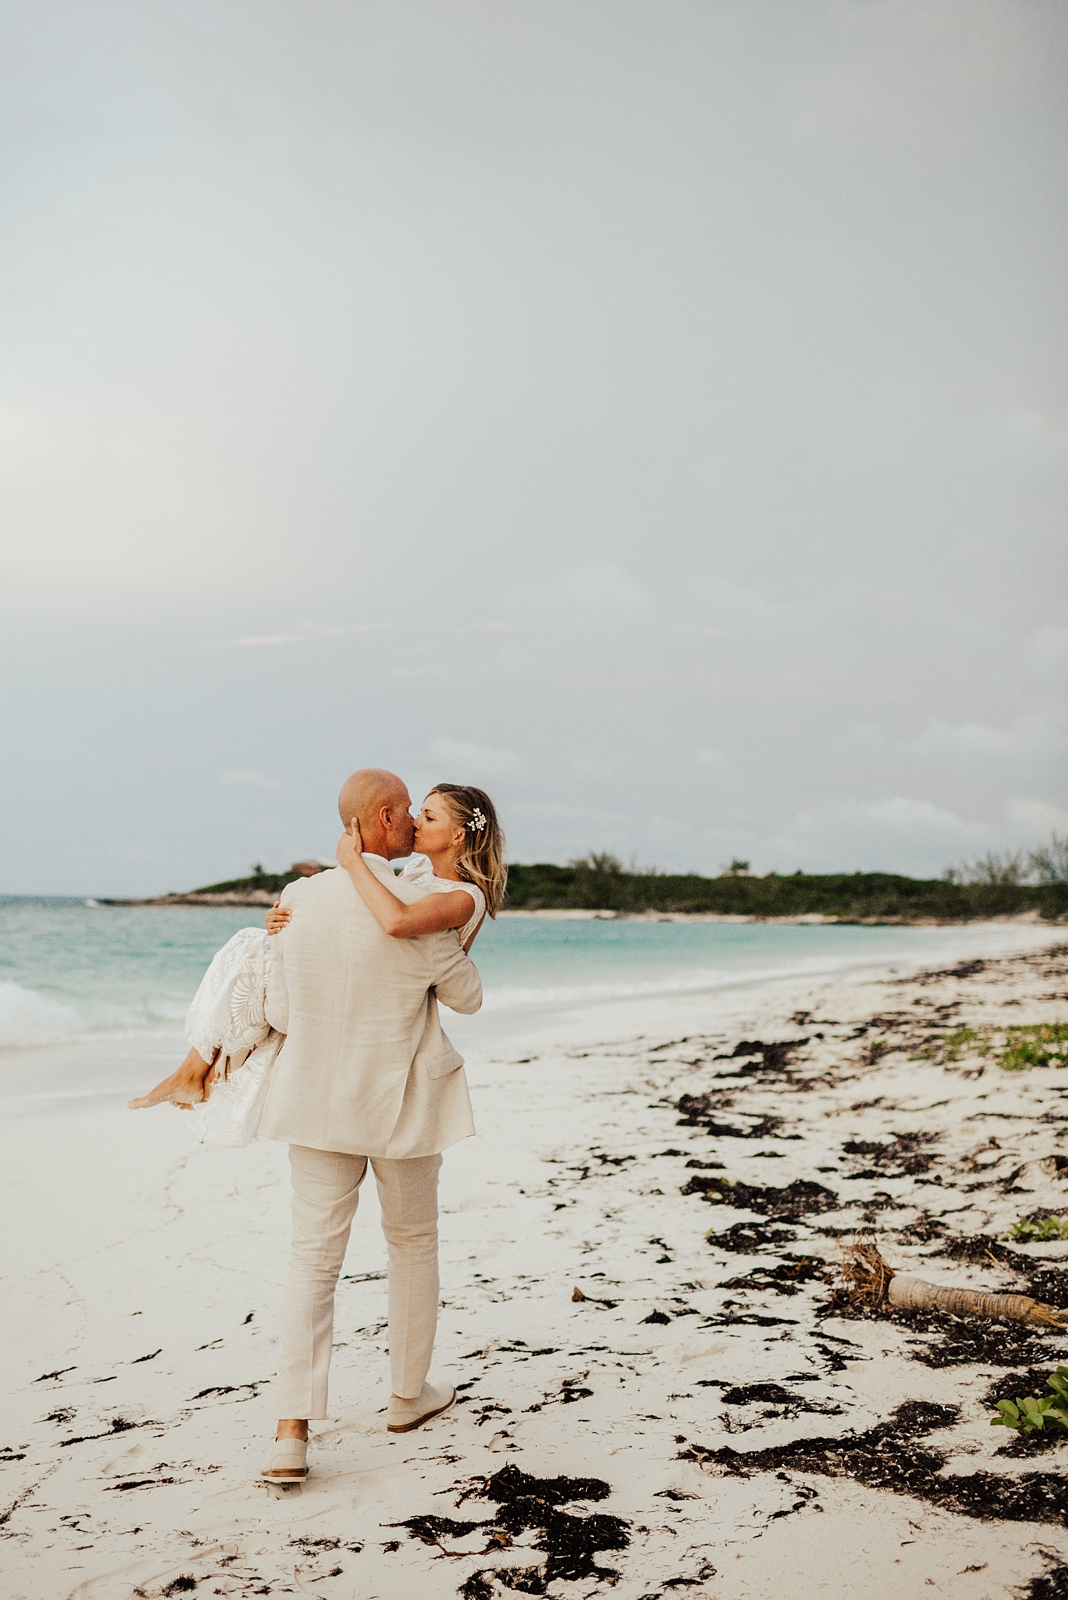 Jenni & Andrew Intimate Beach Destination Wedding in Little Exuma, Bahamas_0529.jpg